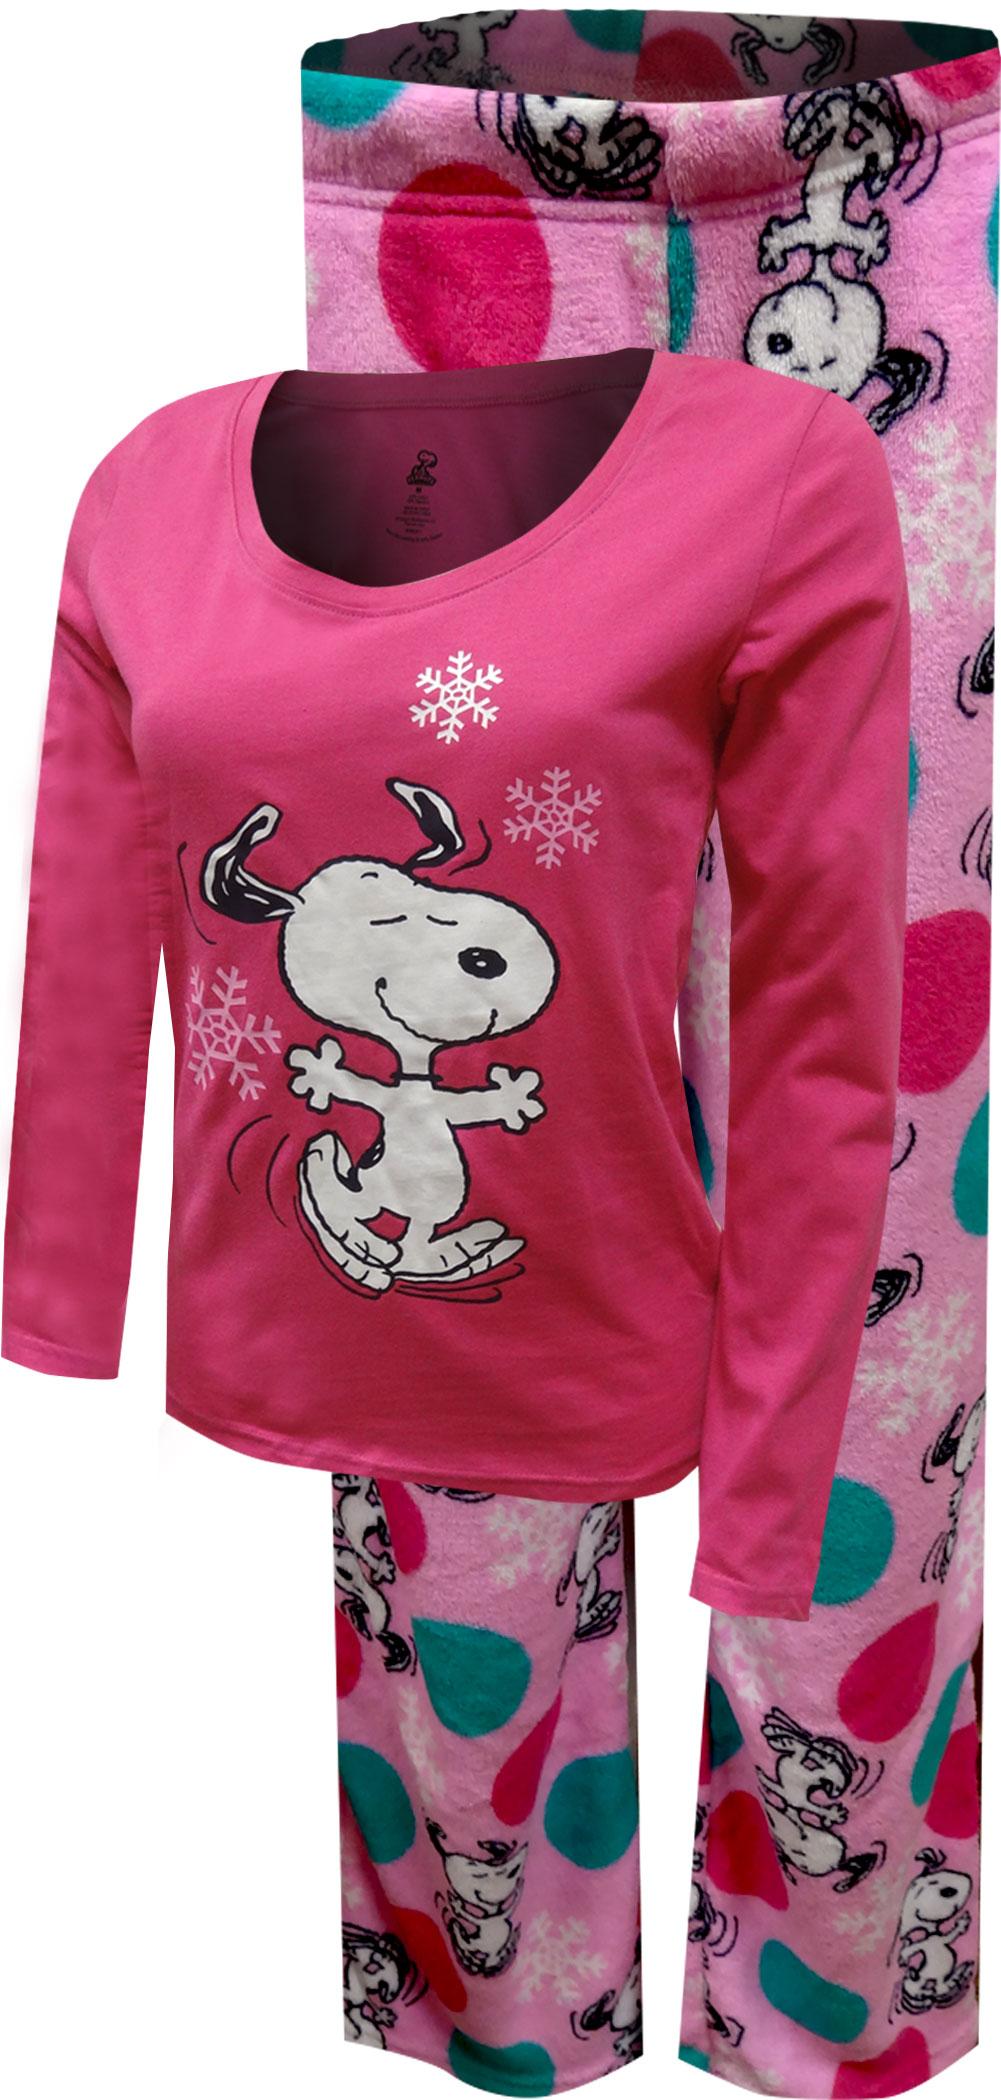 Peanuts Snoopy Pink Plush Pajama for women